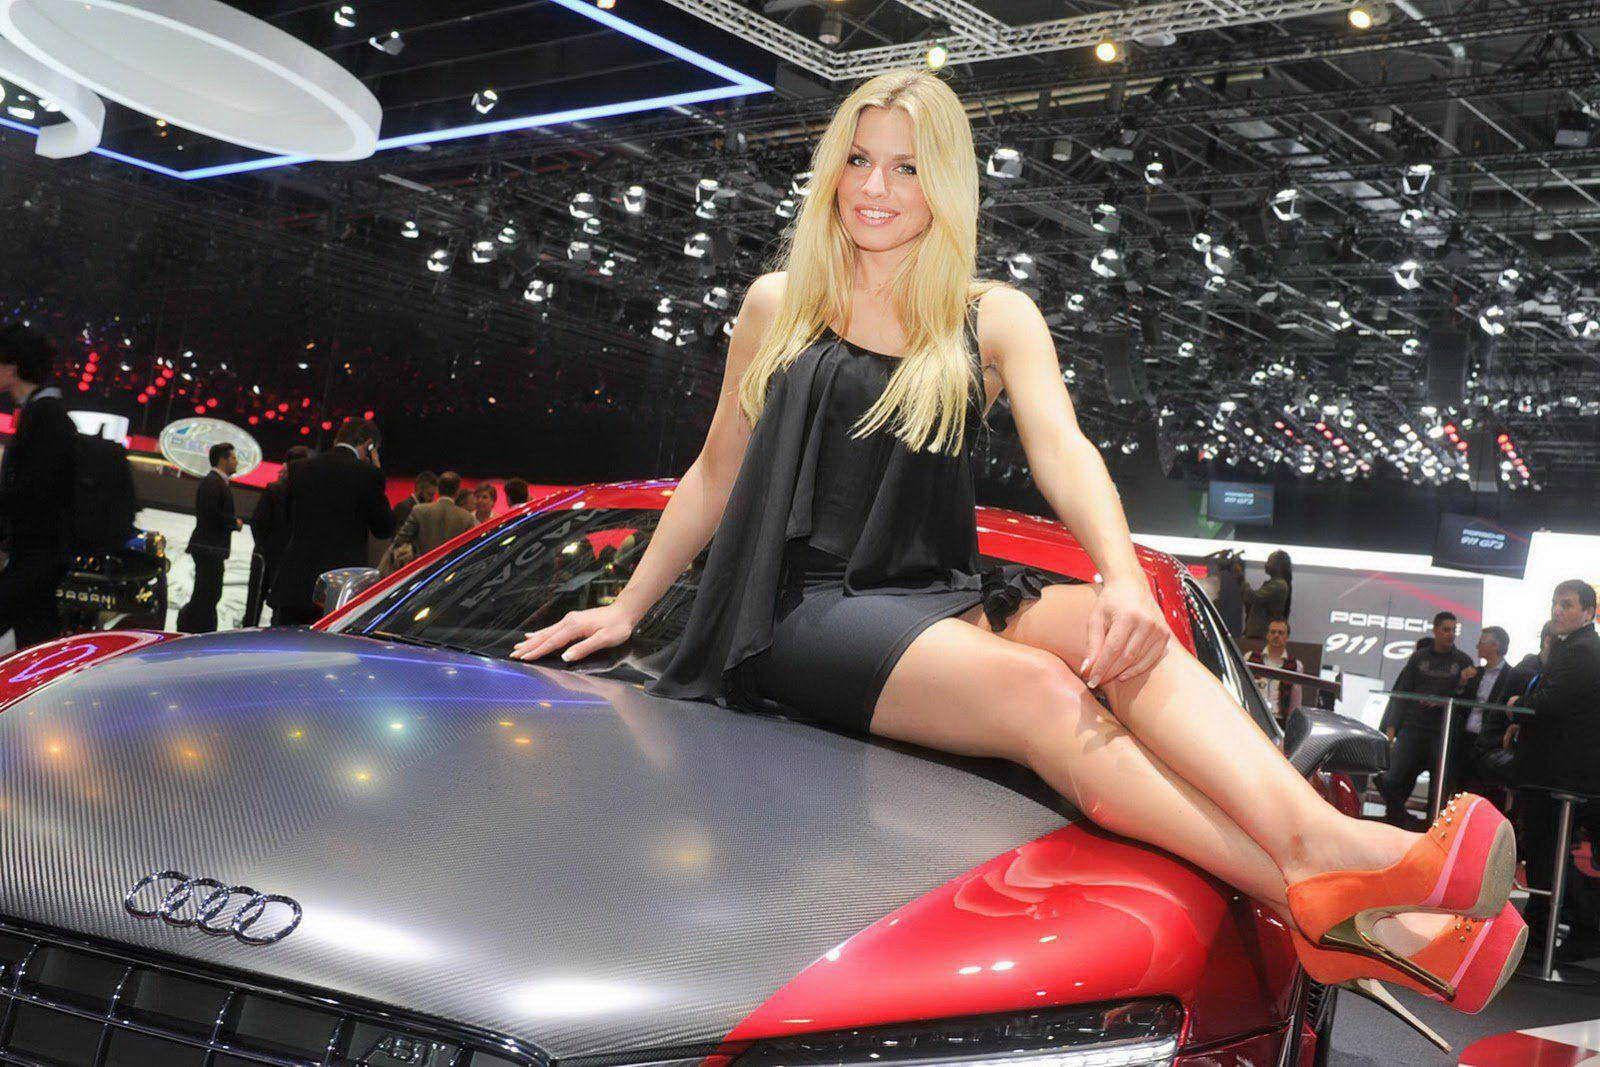 2013 geneva motor show it s a girls thing photo edition